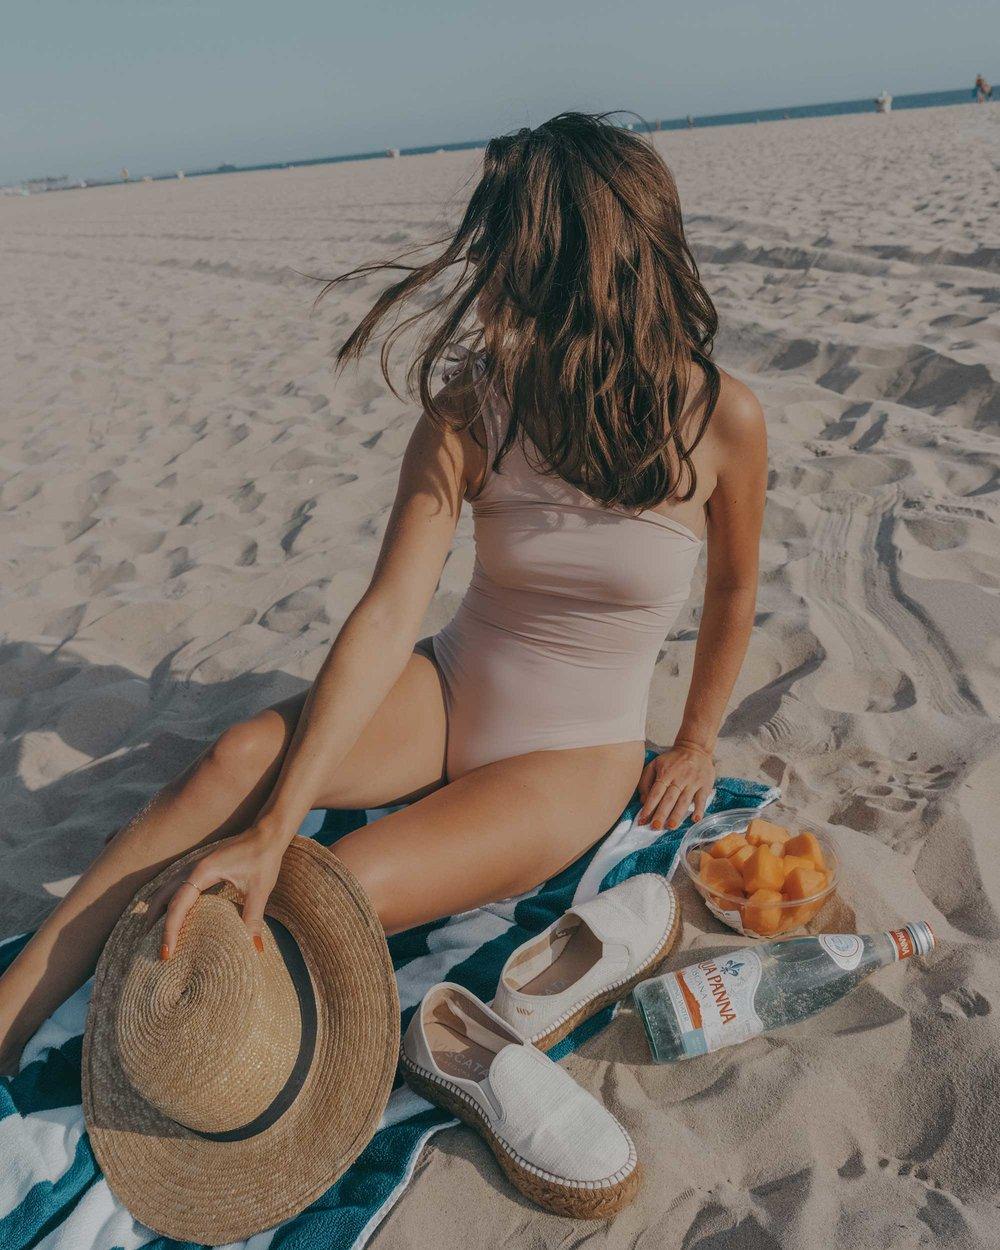 Tavik-Kenton-Asymmetrical-one-shoulder-one-piece-Newport-Beach-california-summer5.jpg